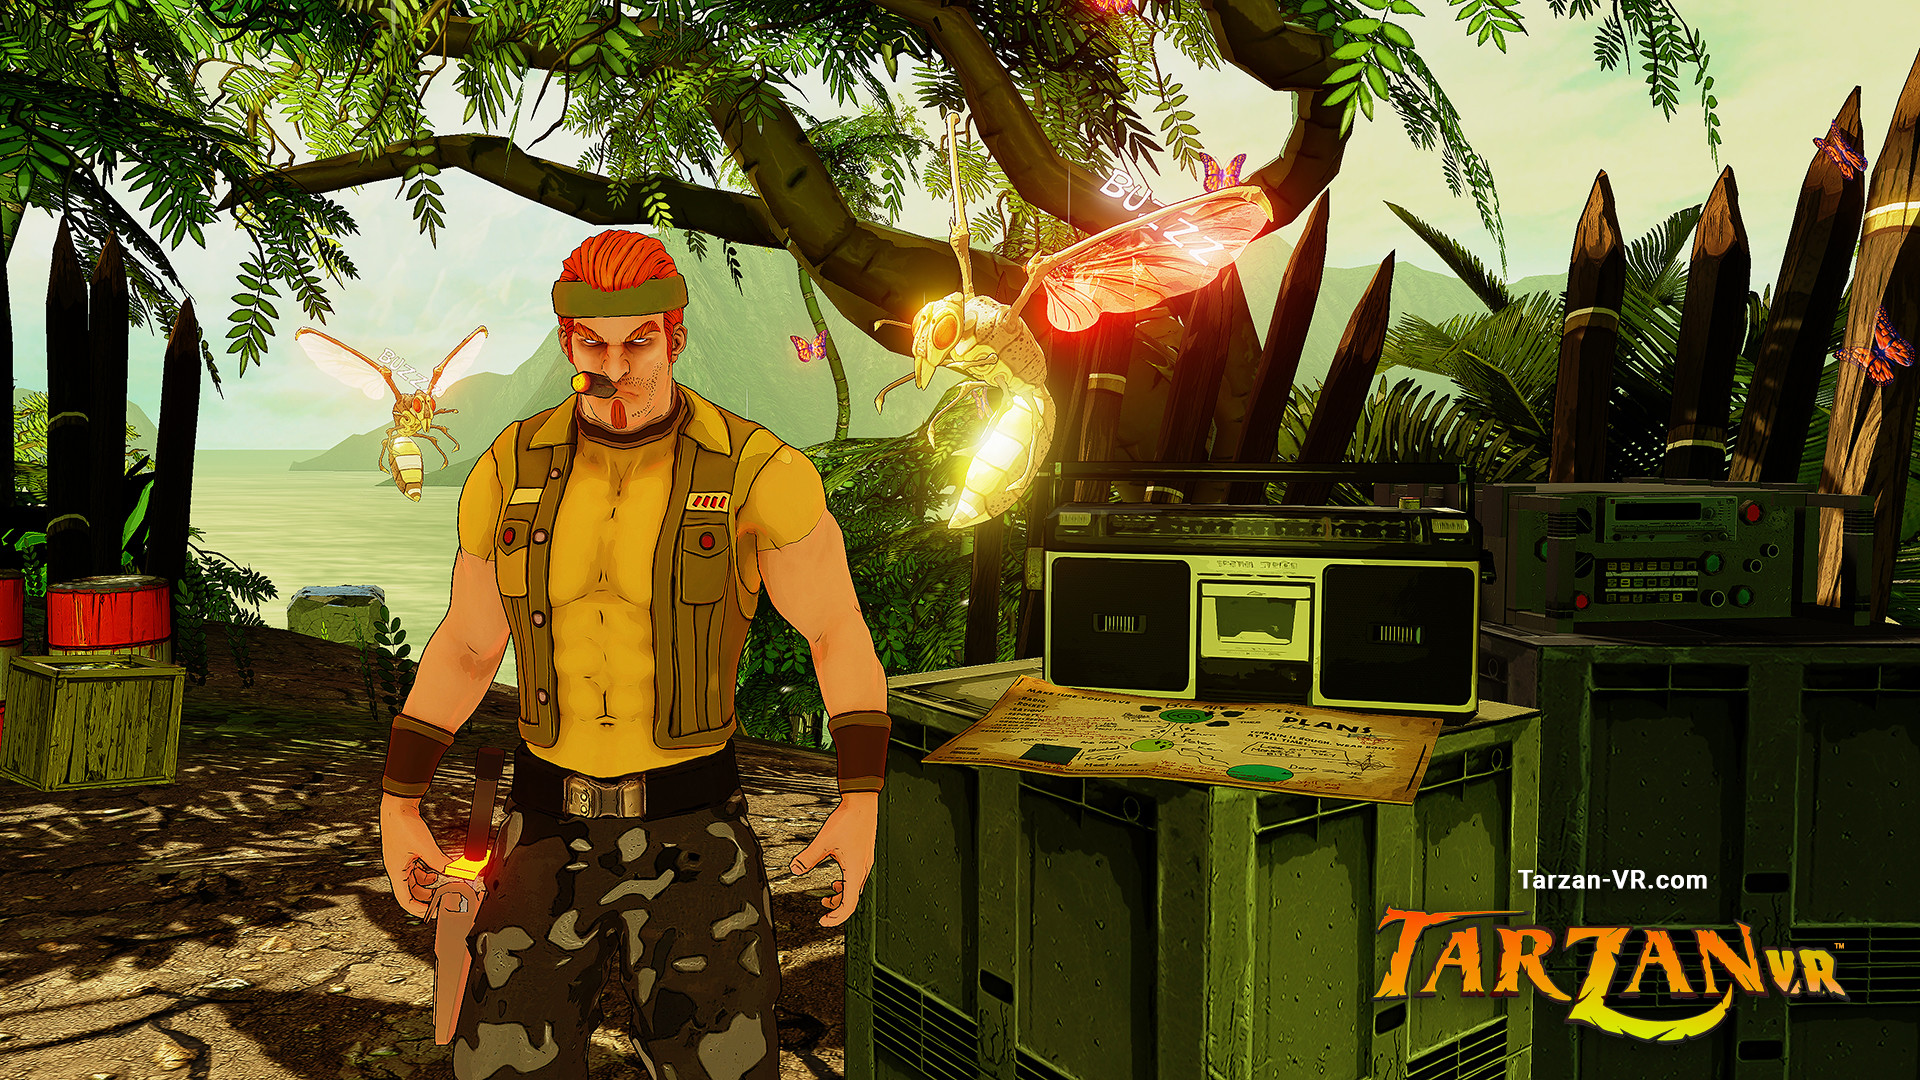 Tarzan VR,  Issue #2 - THE JAGGED EDGE screenshot